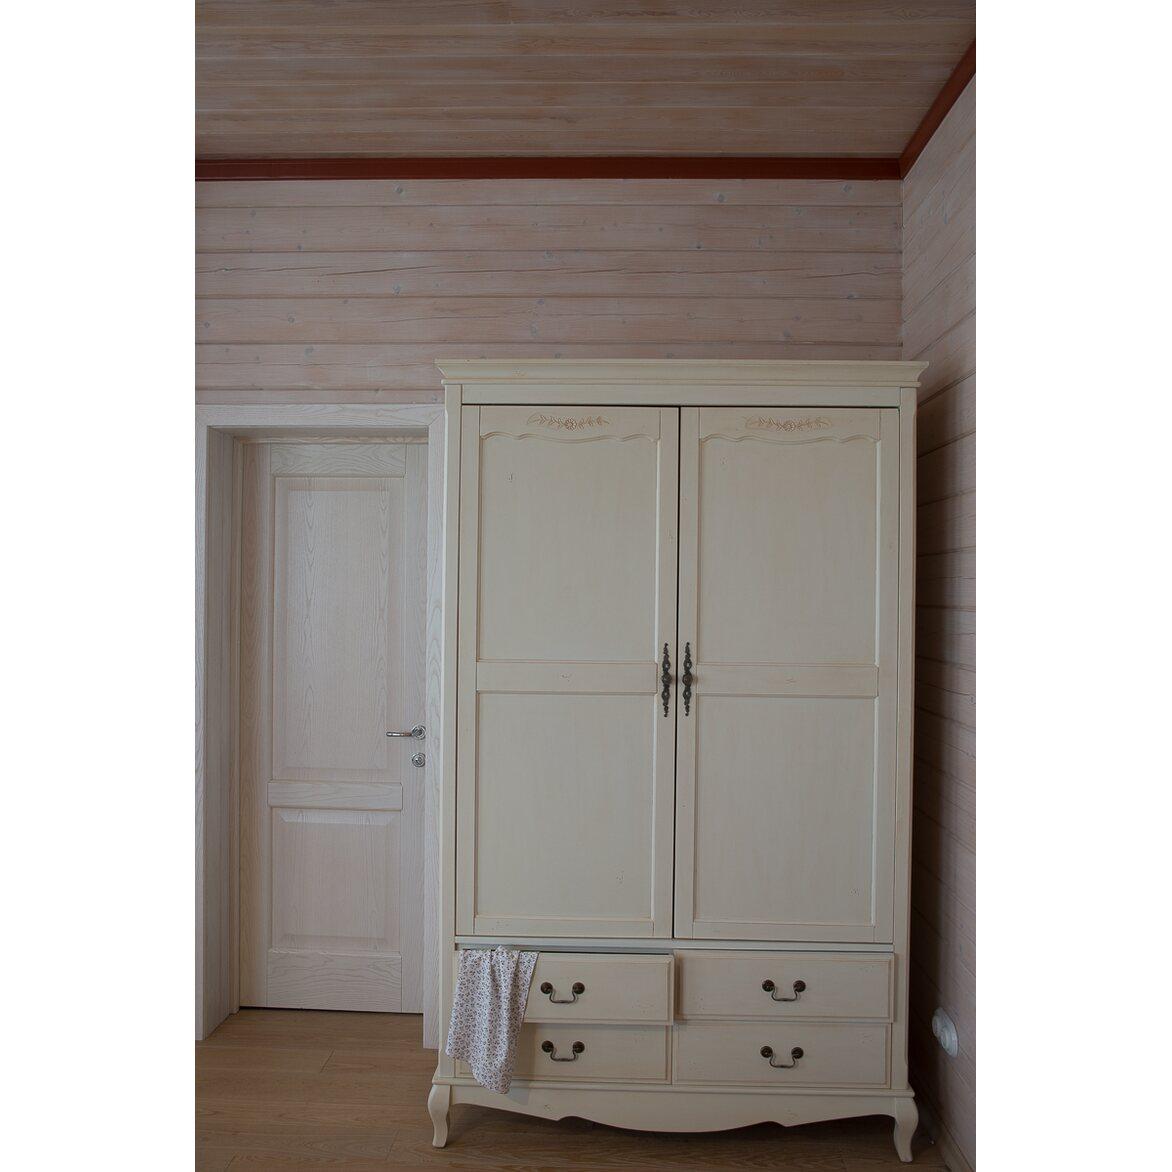 Шкаф двухстворчатый с 4-я ящиками Leontina, бежевого цвета 3 | Платяные шкафы Kingsby